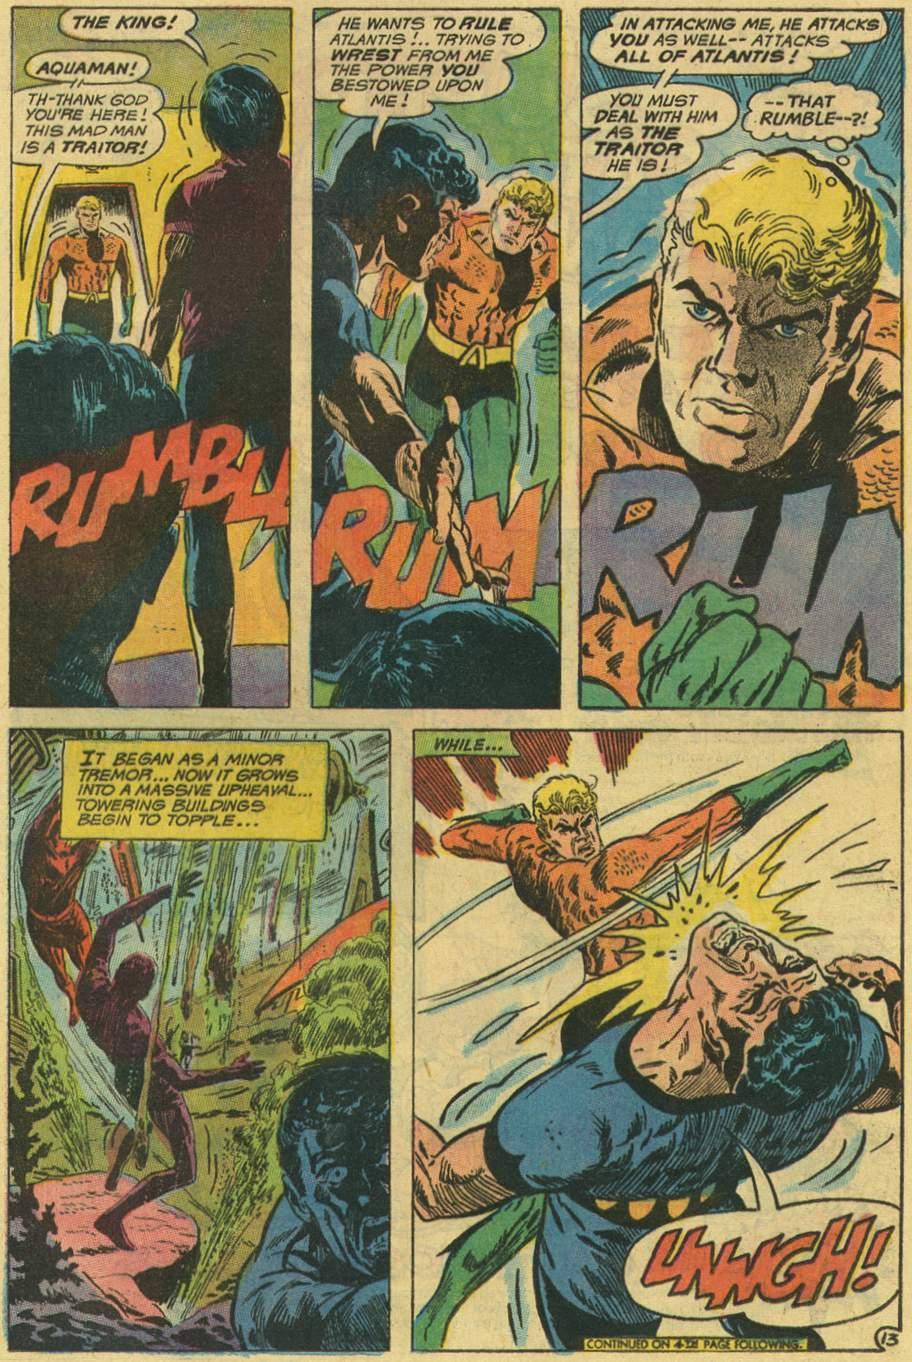 Read online Aquaman (1962) comic -  Issue #48 - 17